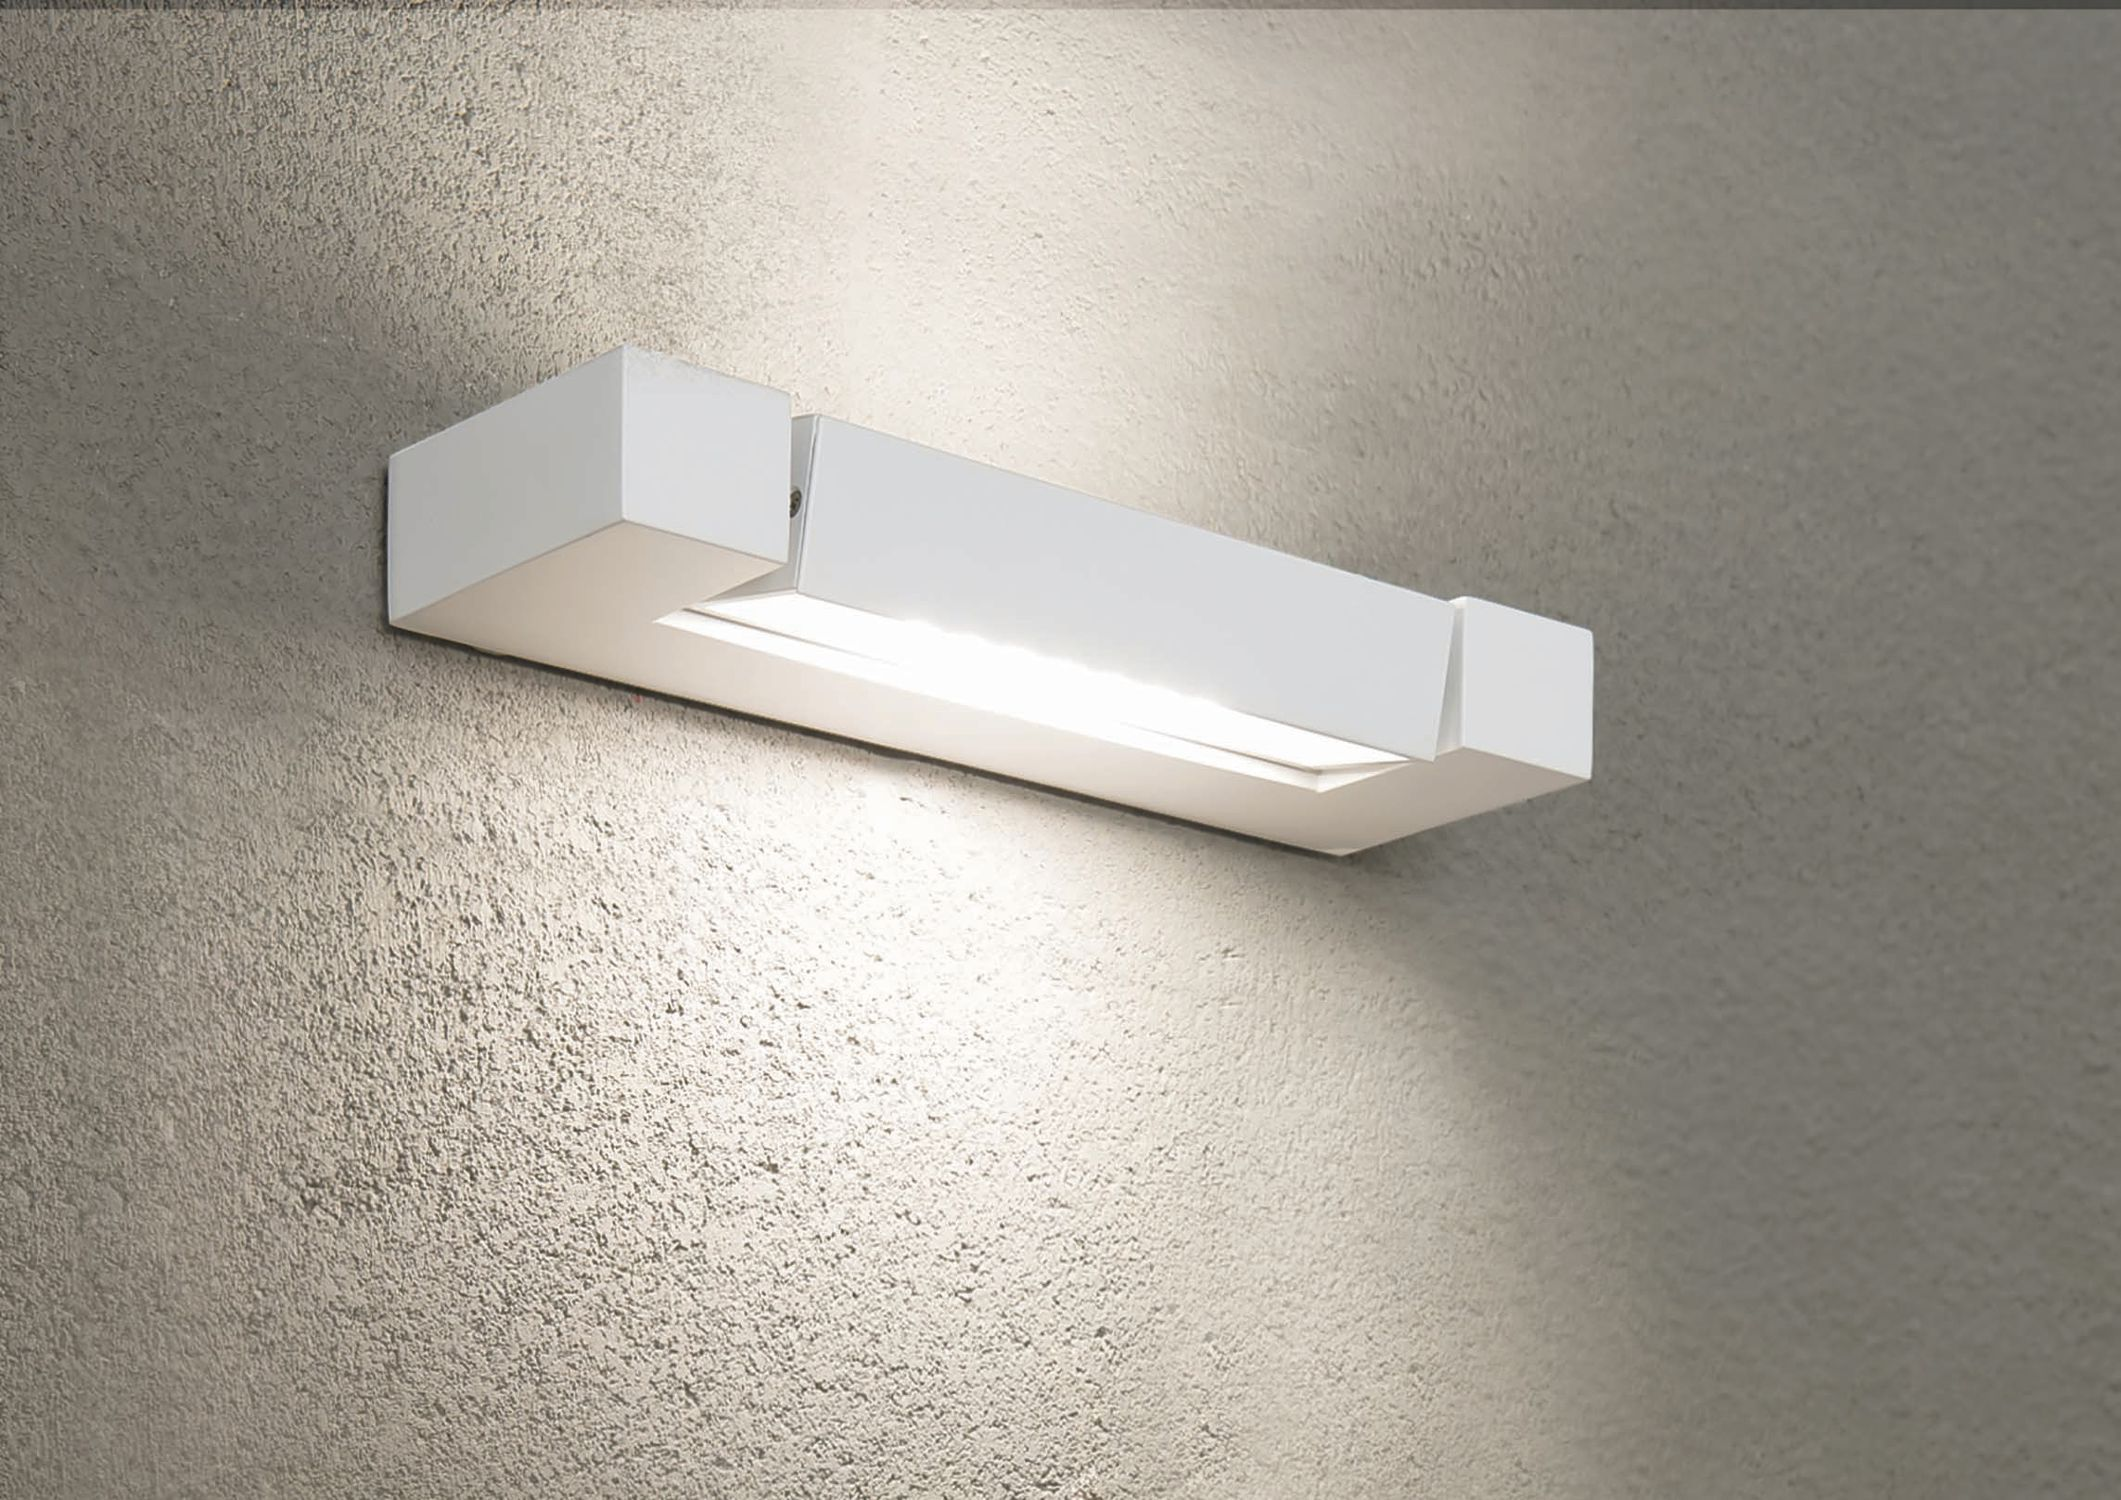 Lampada da parete applique luce moderno vetro gocce cristallo